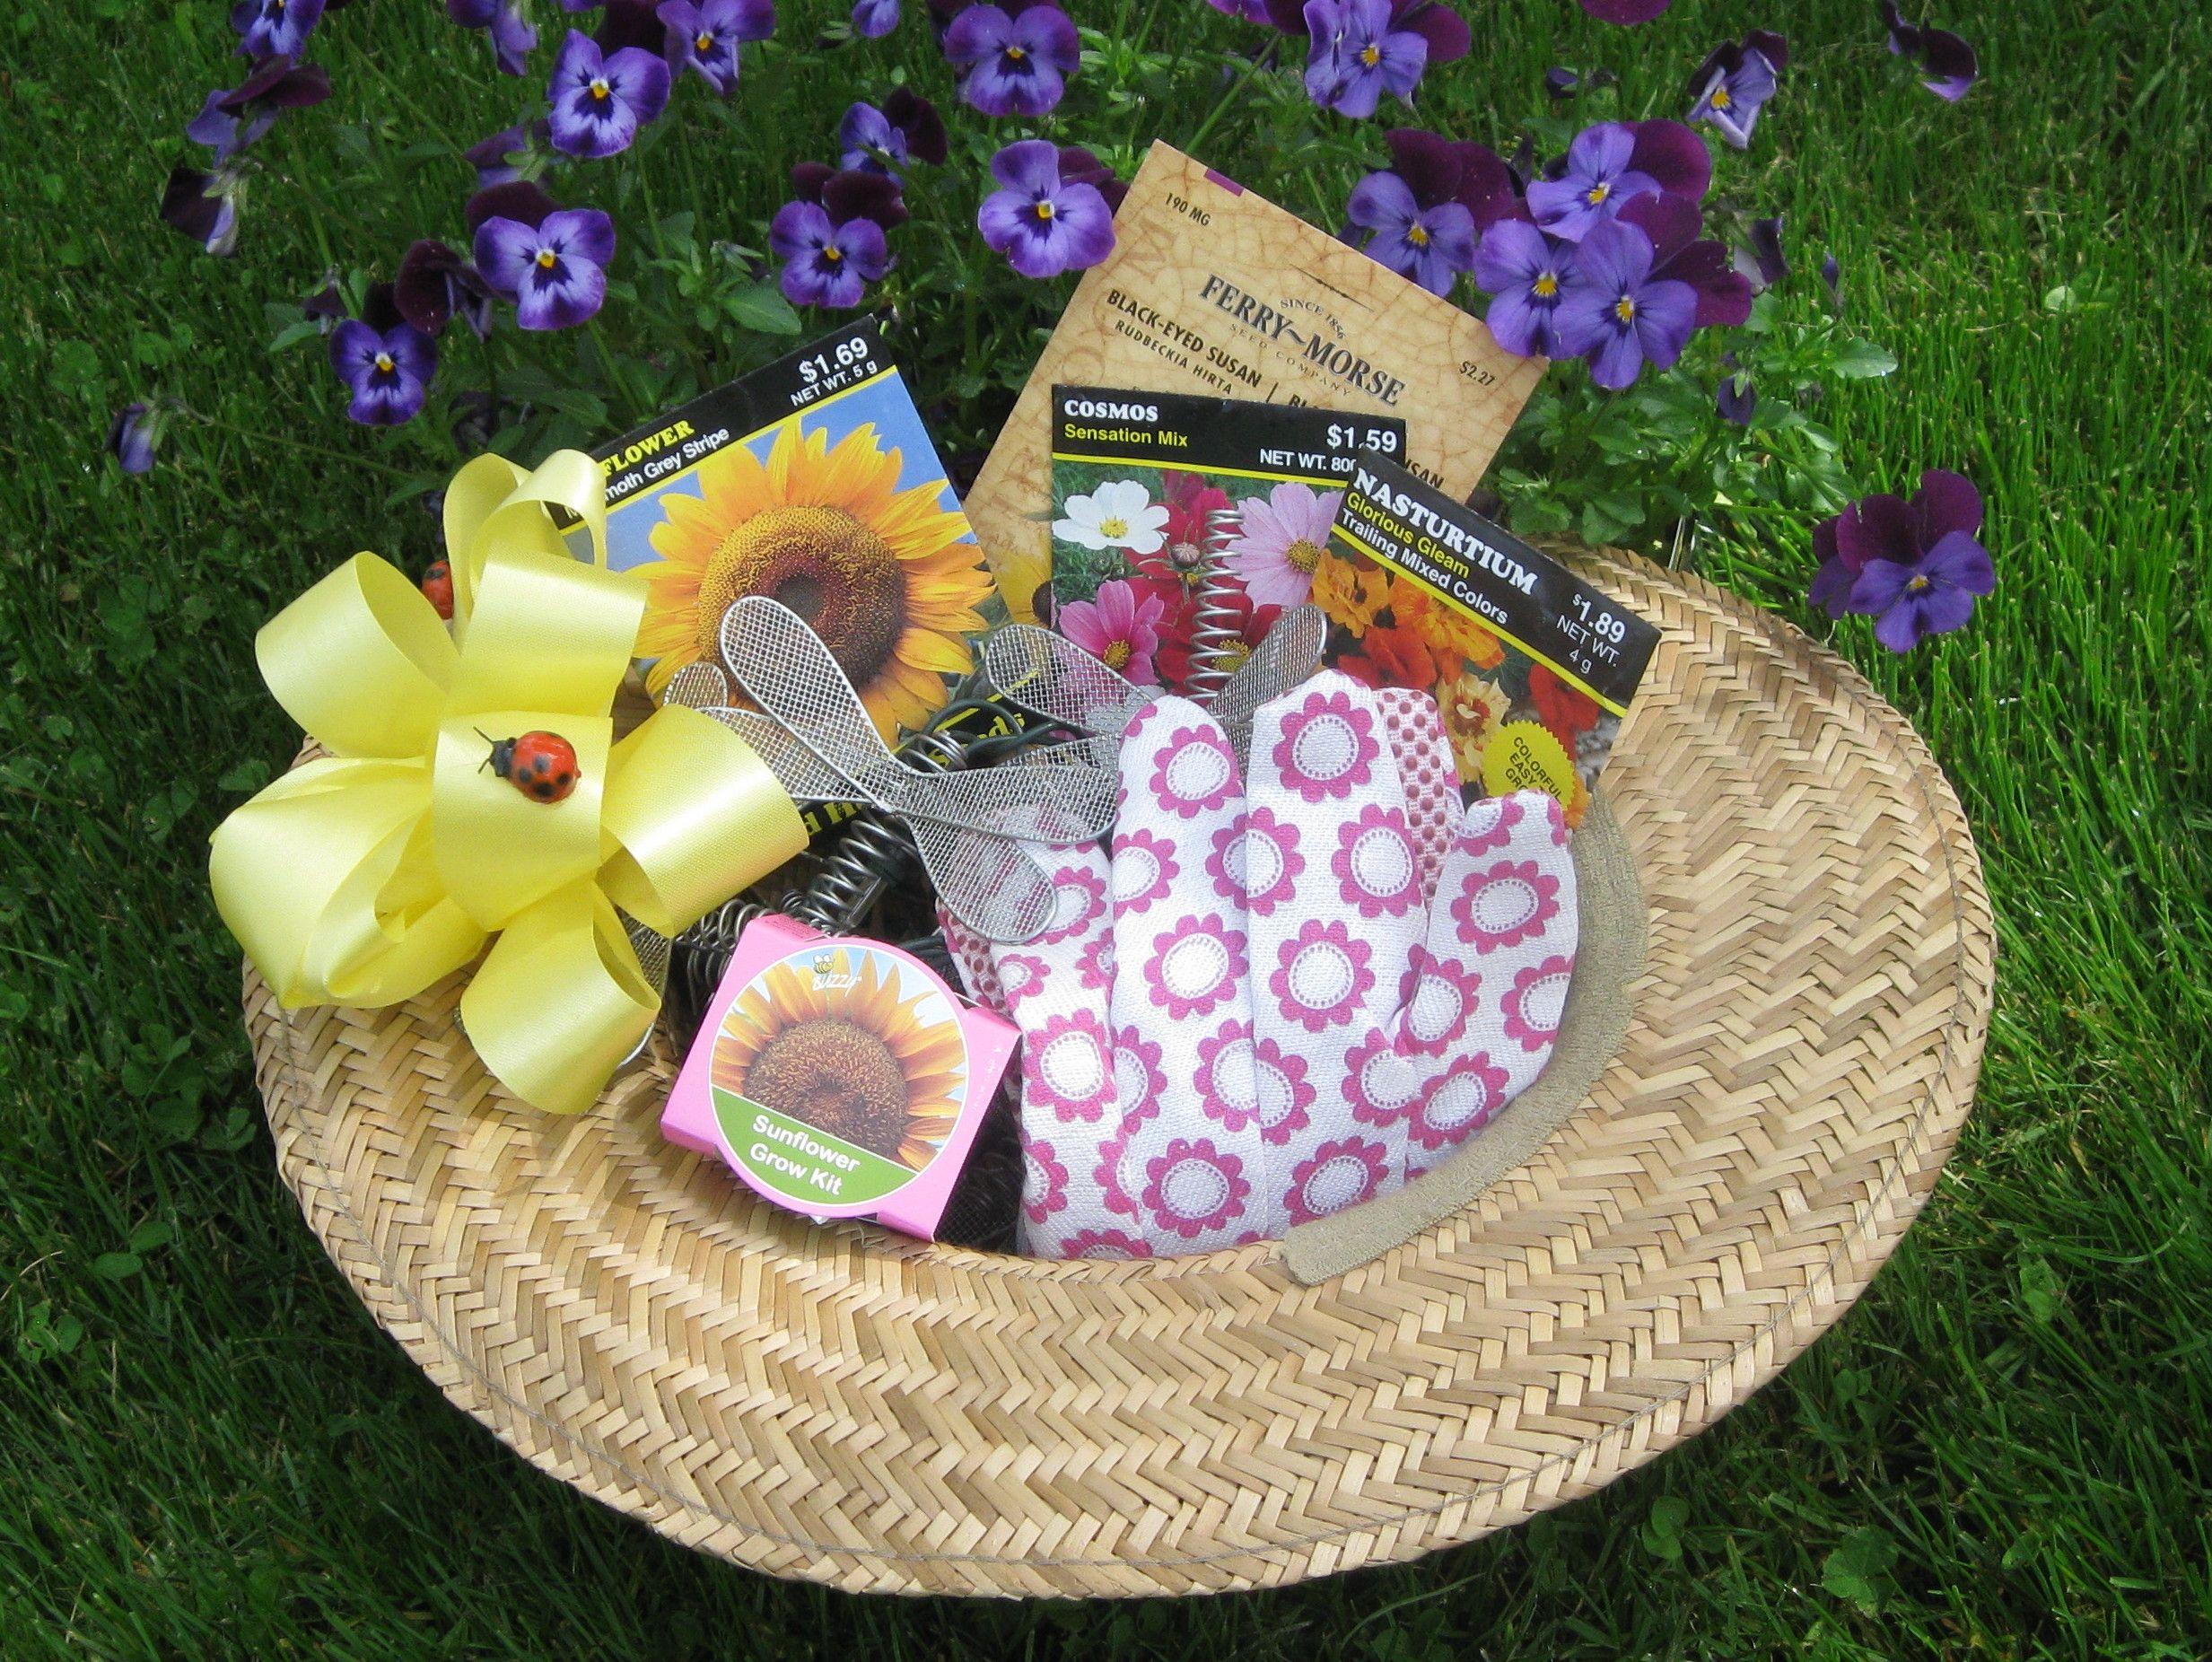 gardening gift baskets Make a garden hat into a gift